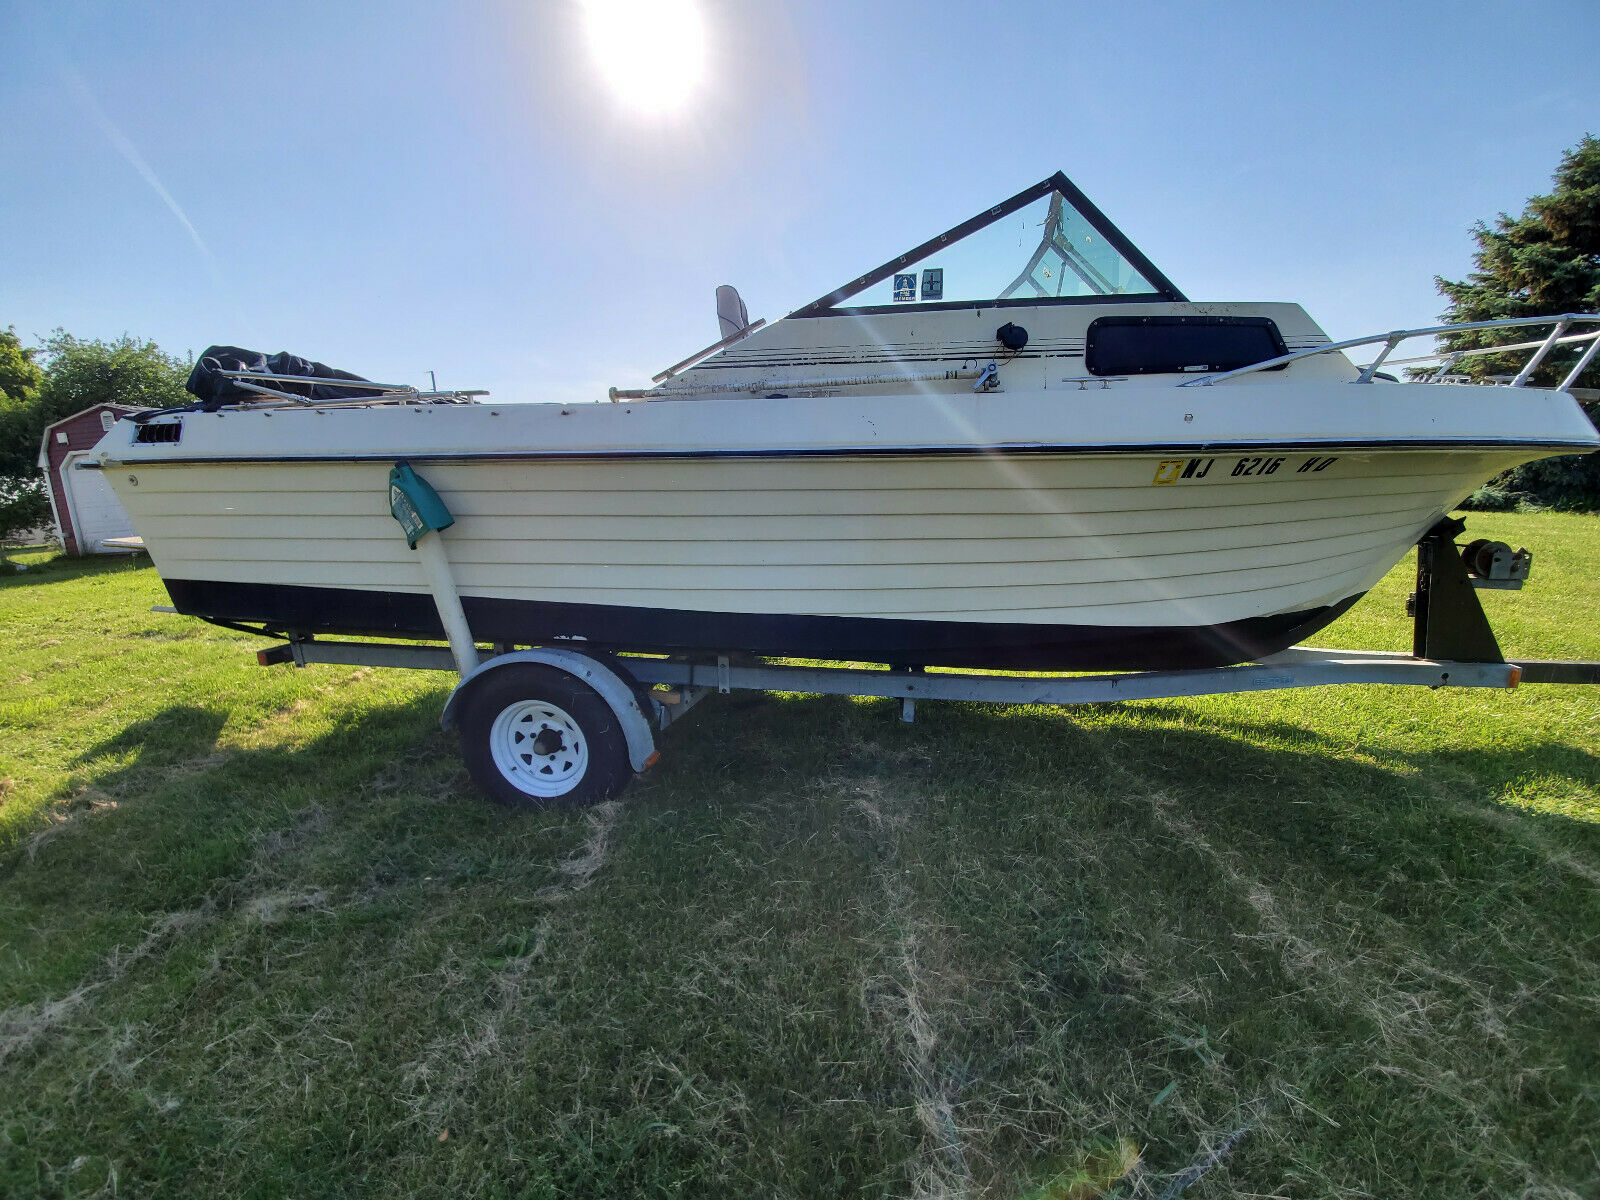 1986 Manatee 21 Foot Cuddy Cabin Boat